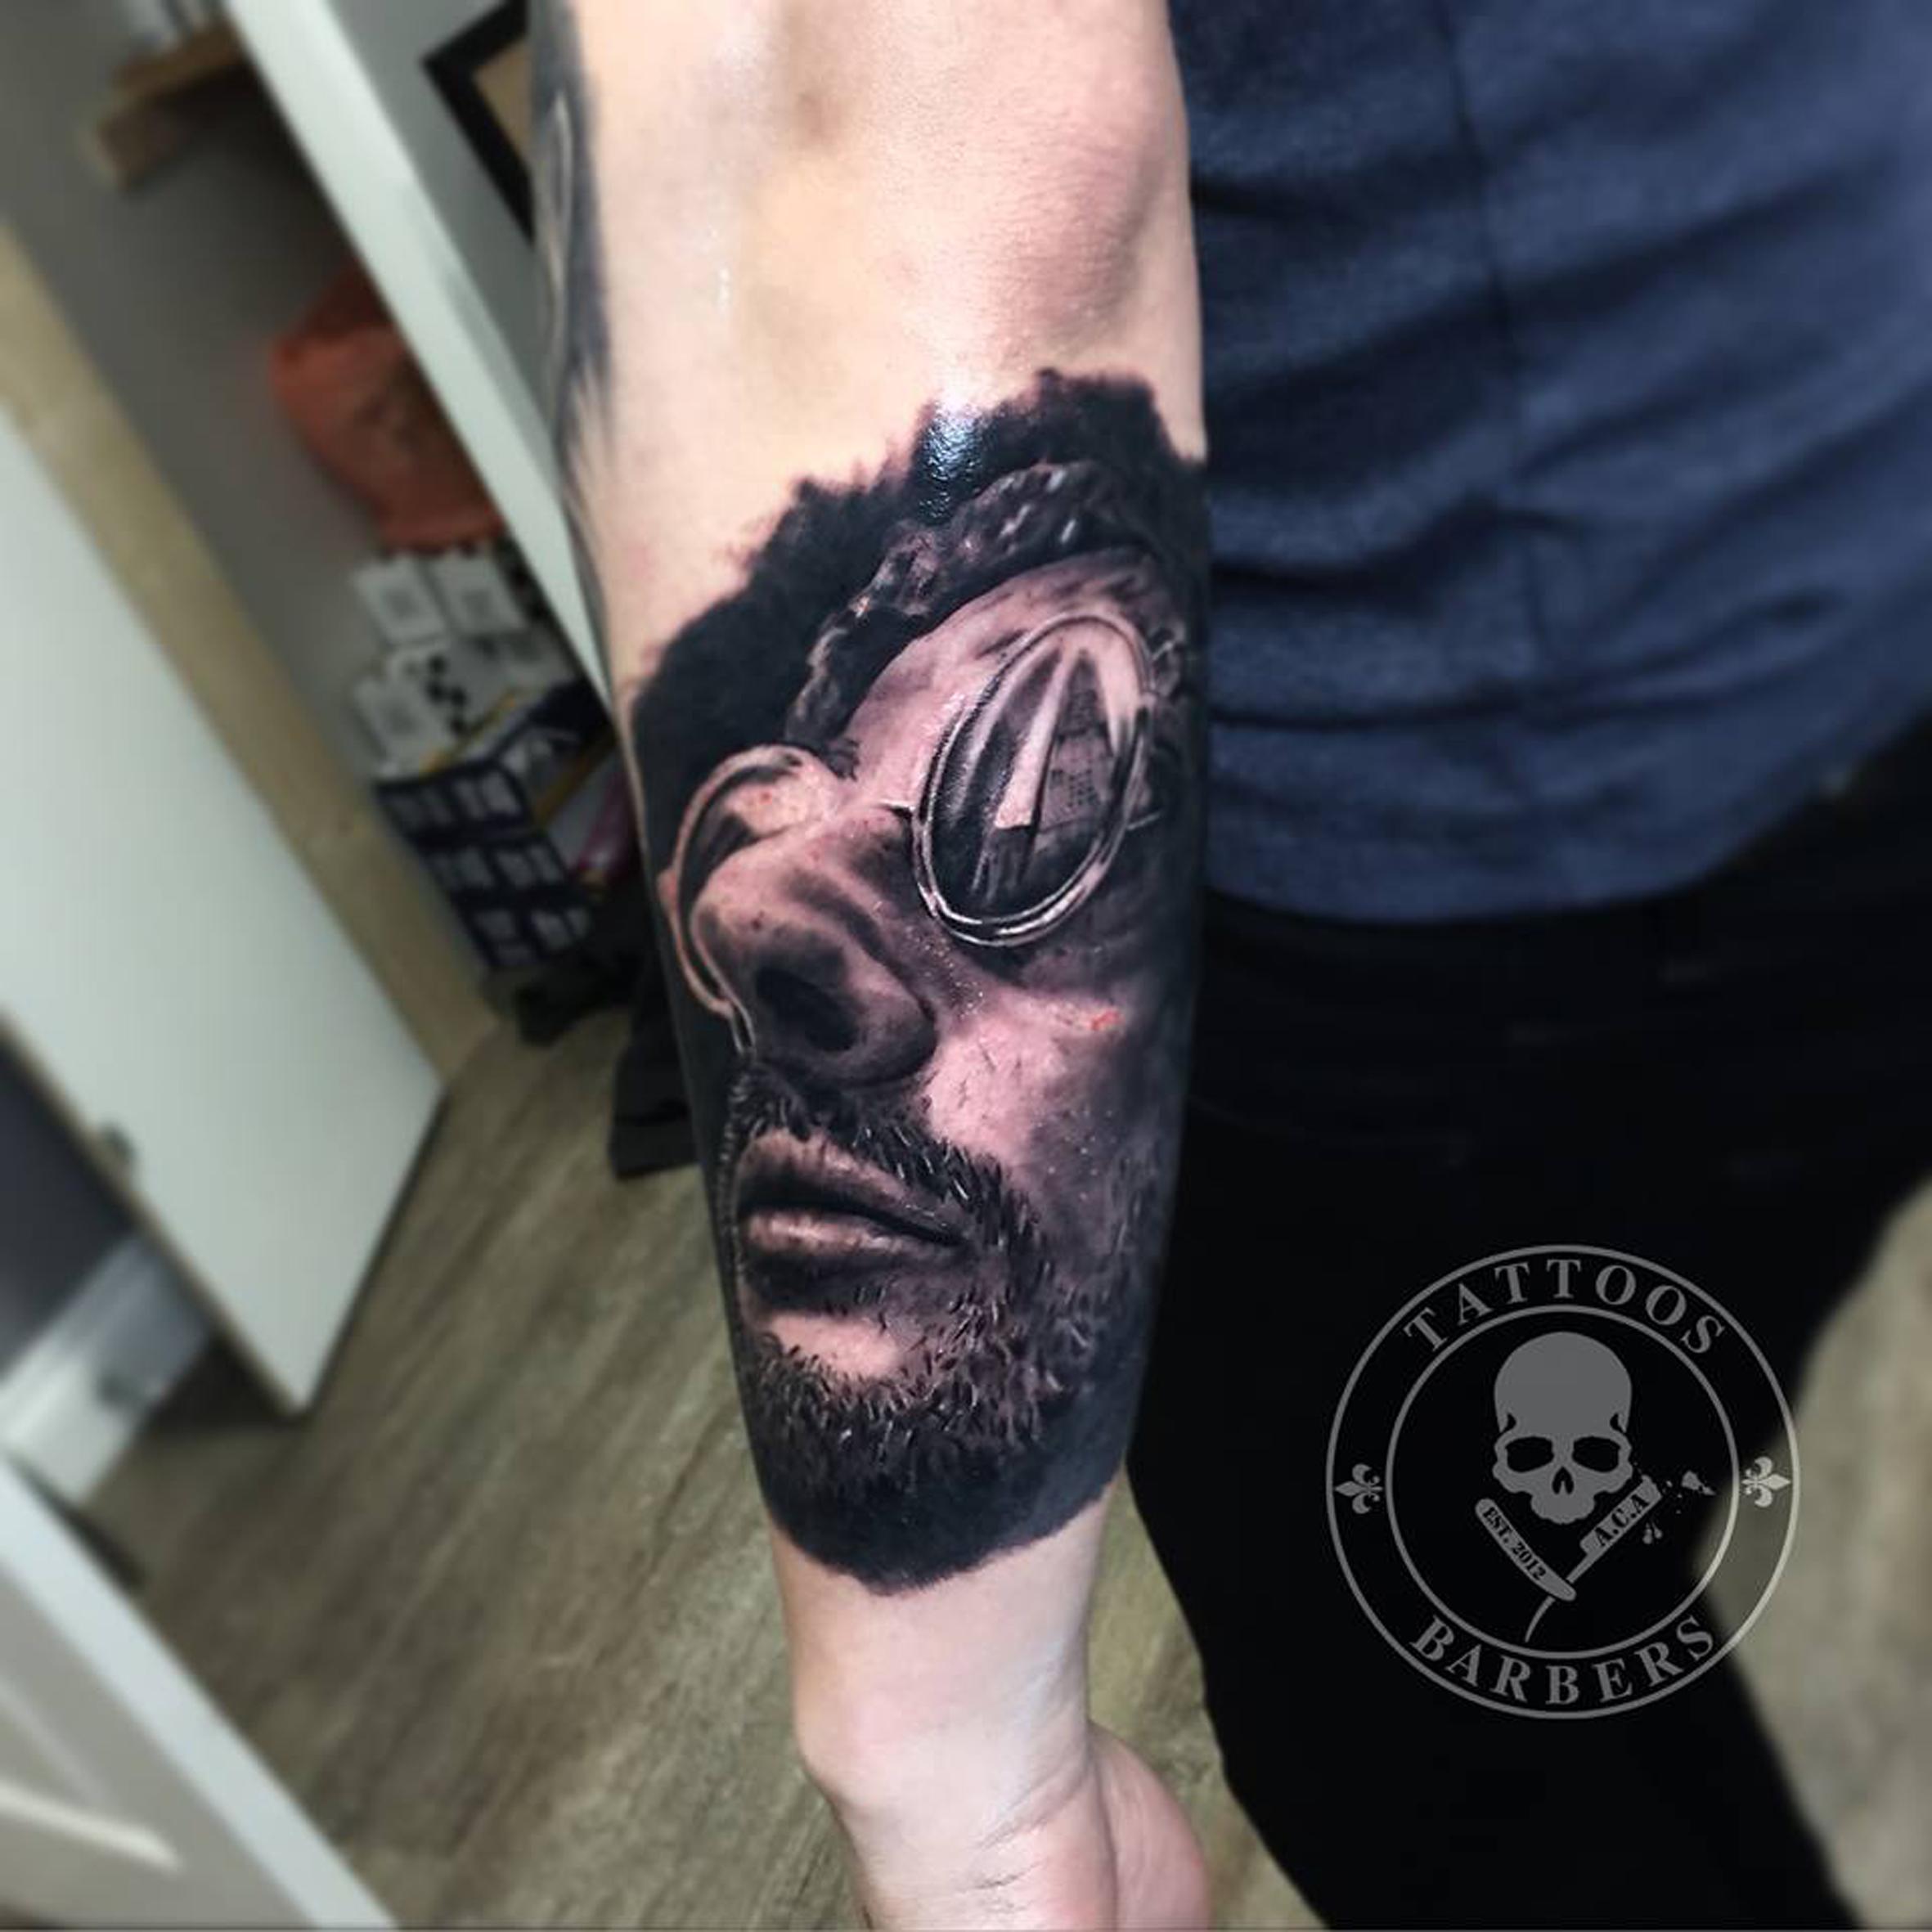 A Cut of Art Tattoo Studio & Barbershop in Selsdon, Croydon | Custom Tattoos, Cover-up's, horror tattoos, fine art tattoos, portrait tattoos by Zsolt.